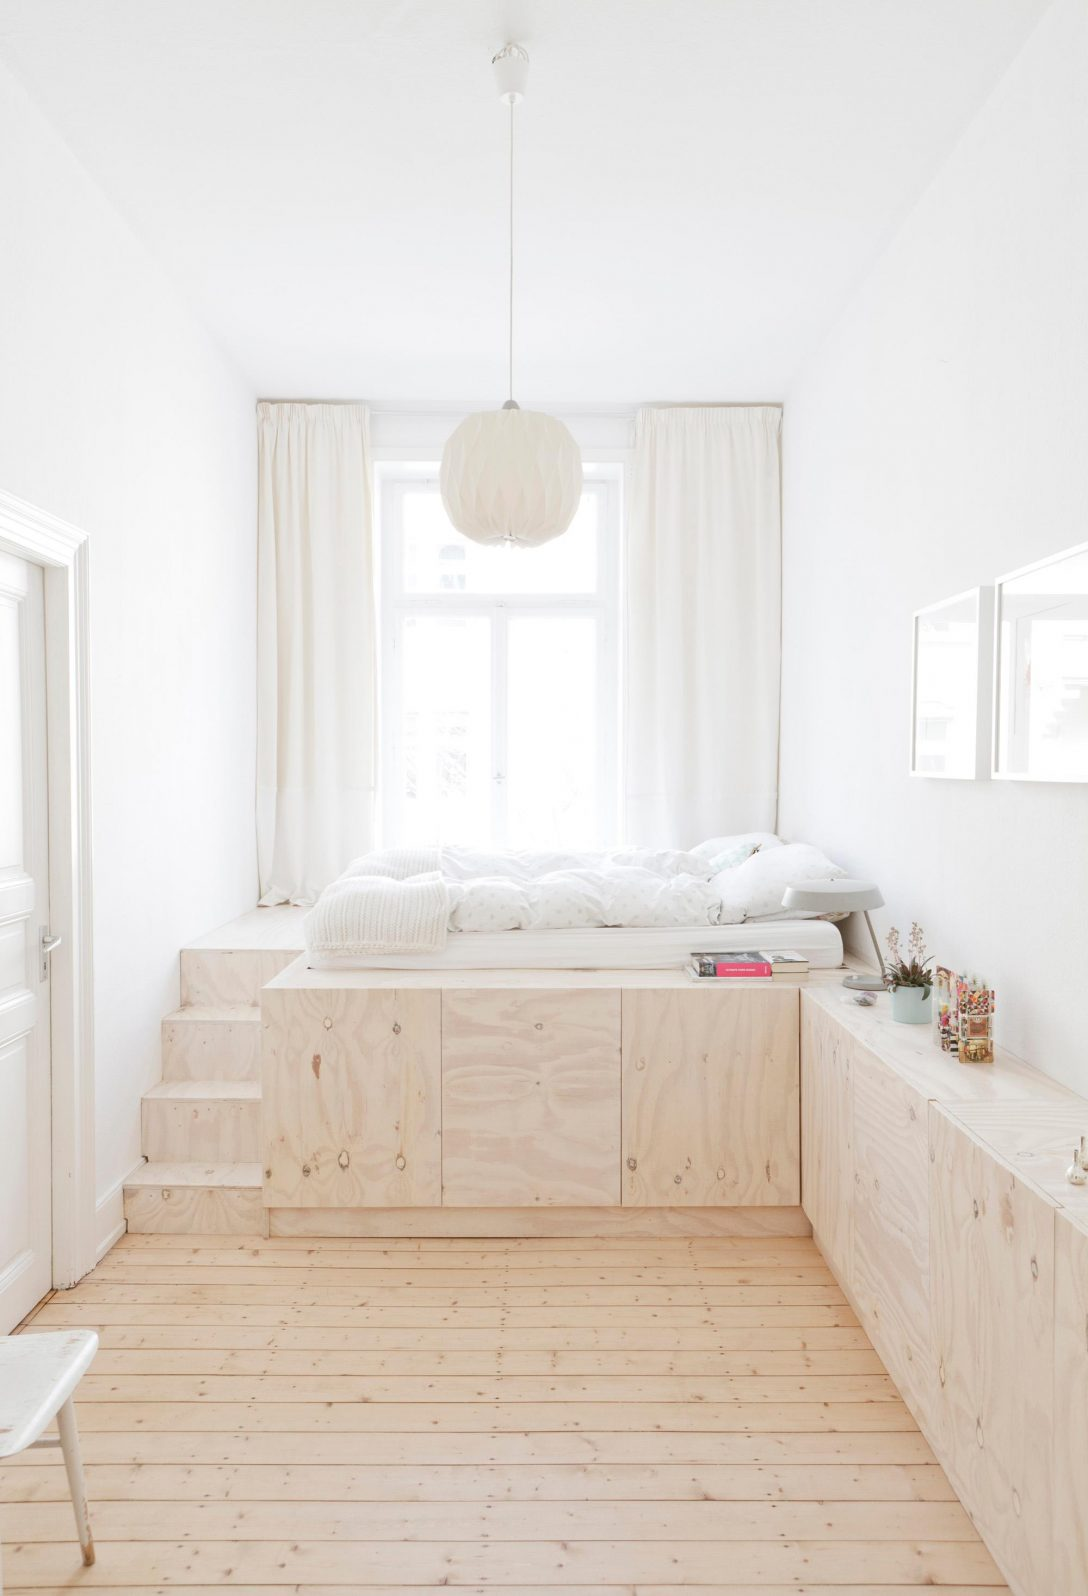 Large Size of Podest Bett Podestbett Bauen Ikea Selber Kosten Darunter Stauraum 160x200 Kaufen Hack Selbst Mit Diy Schlafzimmer Sideboard Bettpodest Kombination B 120x200 Bett Podest Bett